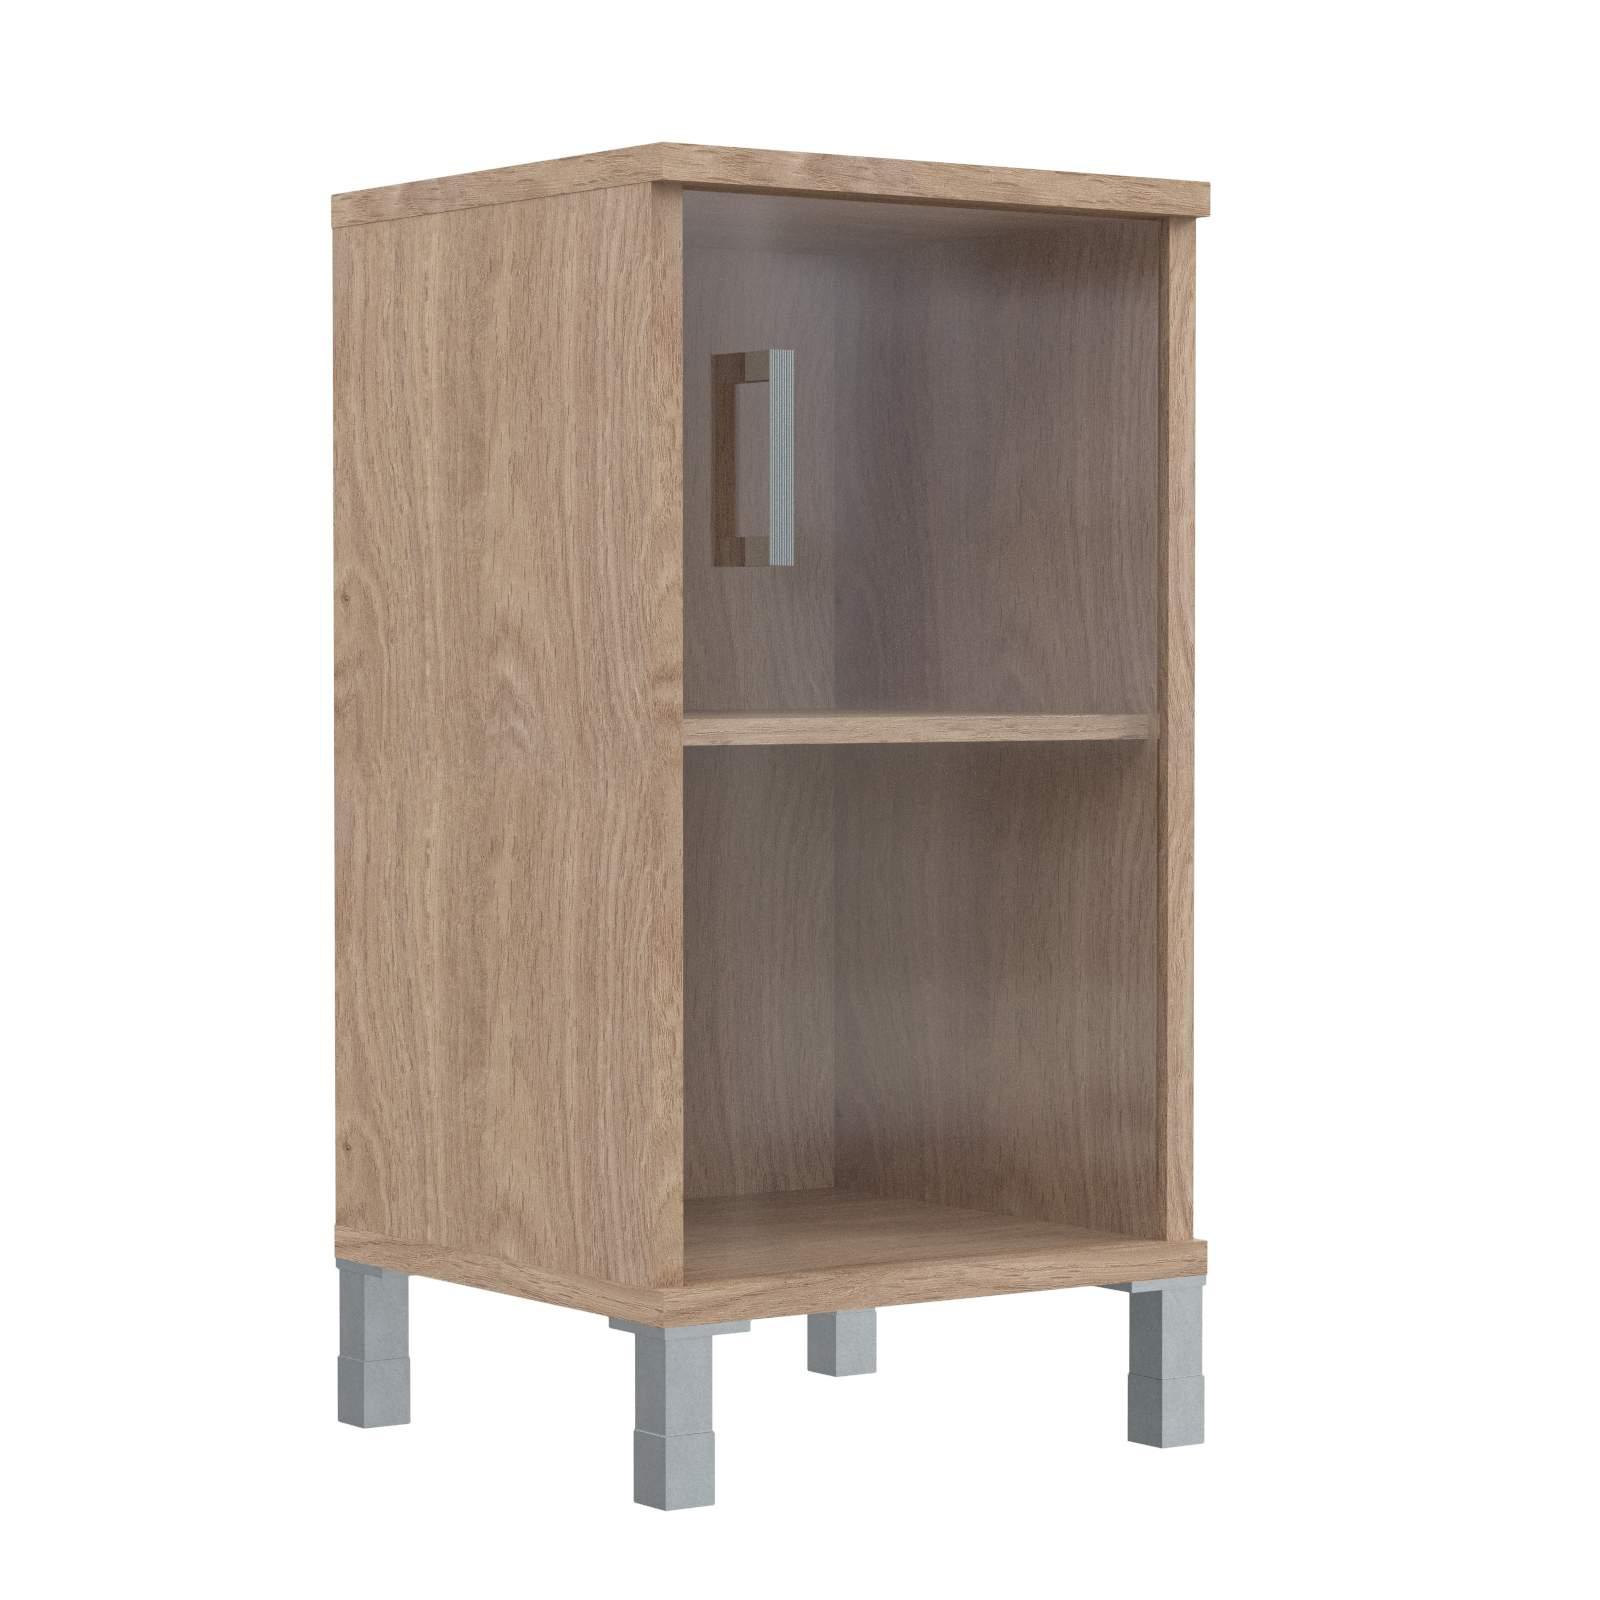 Шкаф колонка низкая со стеклянной дверью 475х435х870